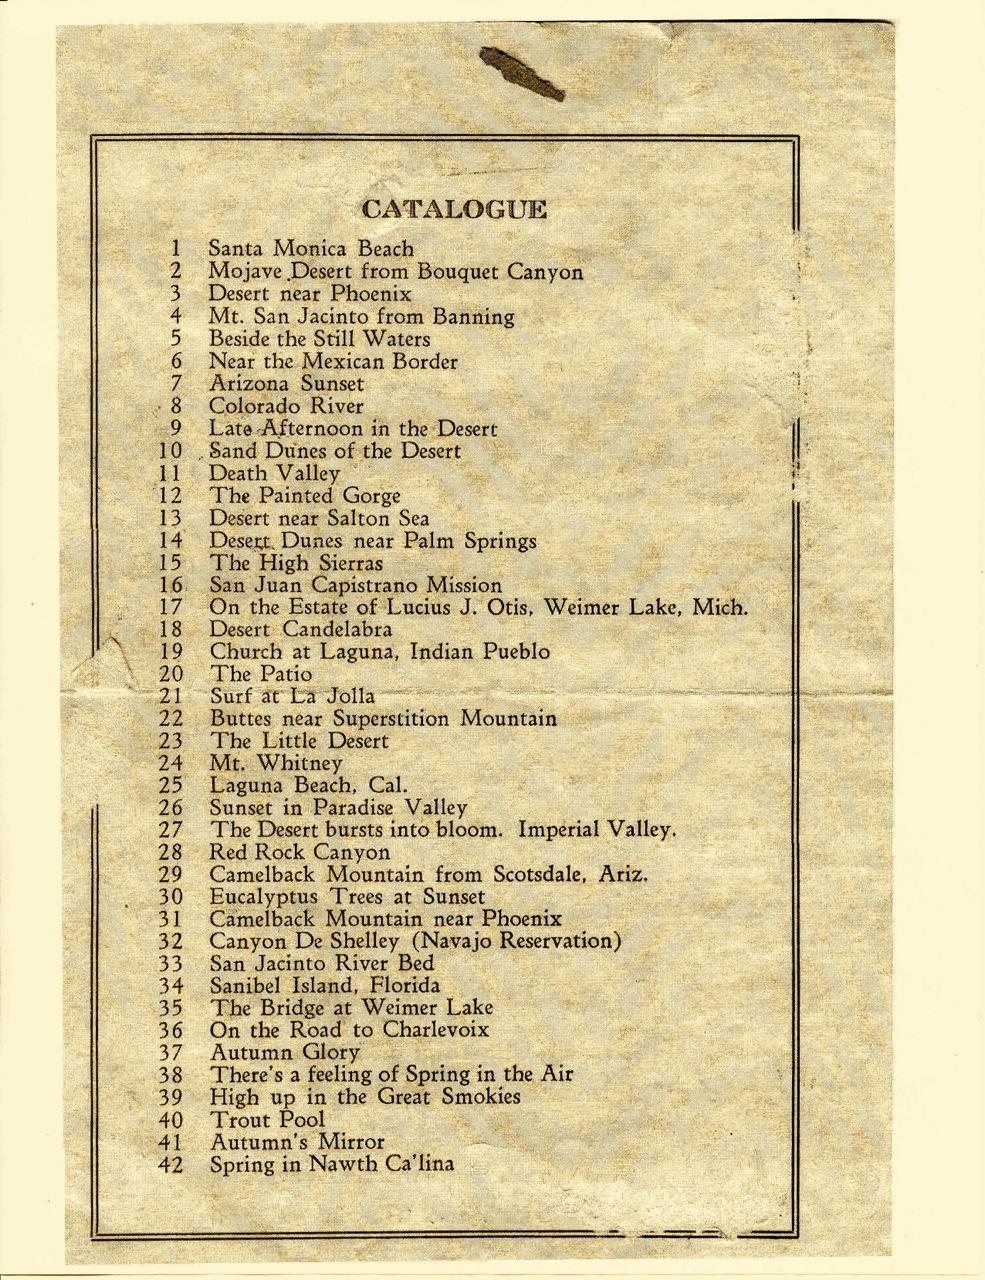 Grace Hall Hemingway exhibit, 1921